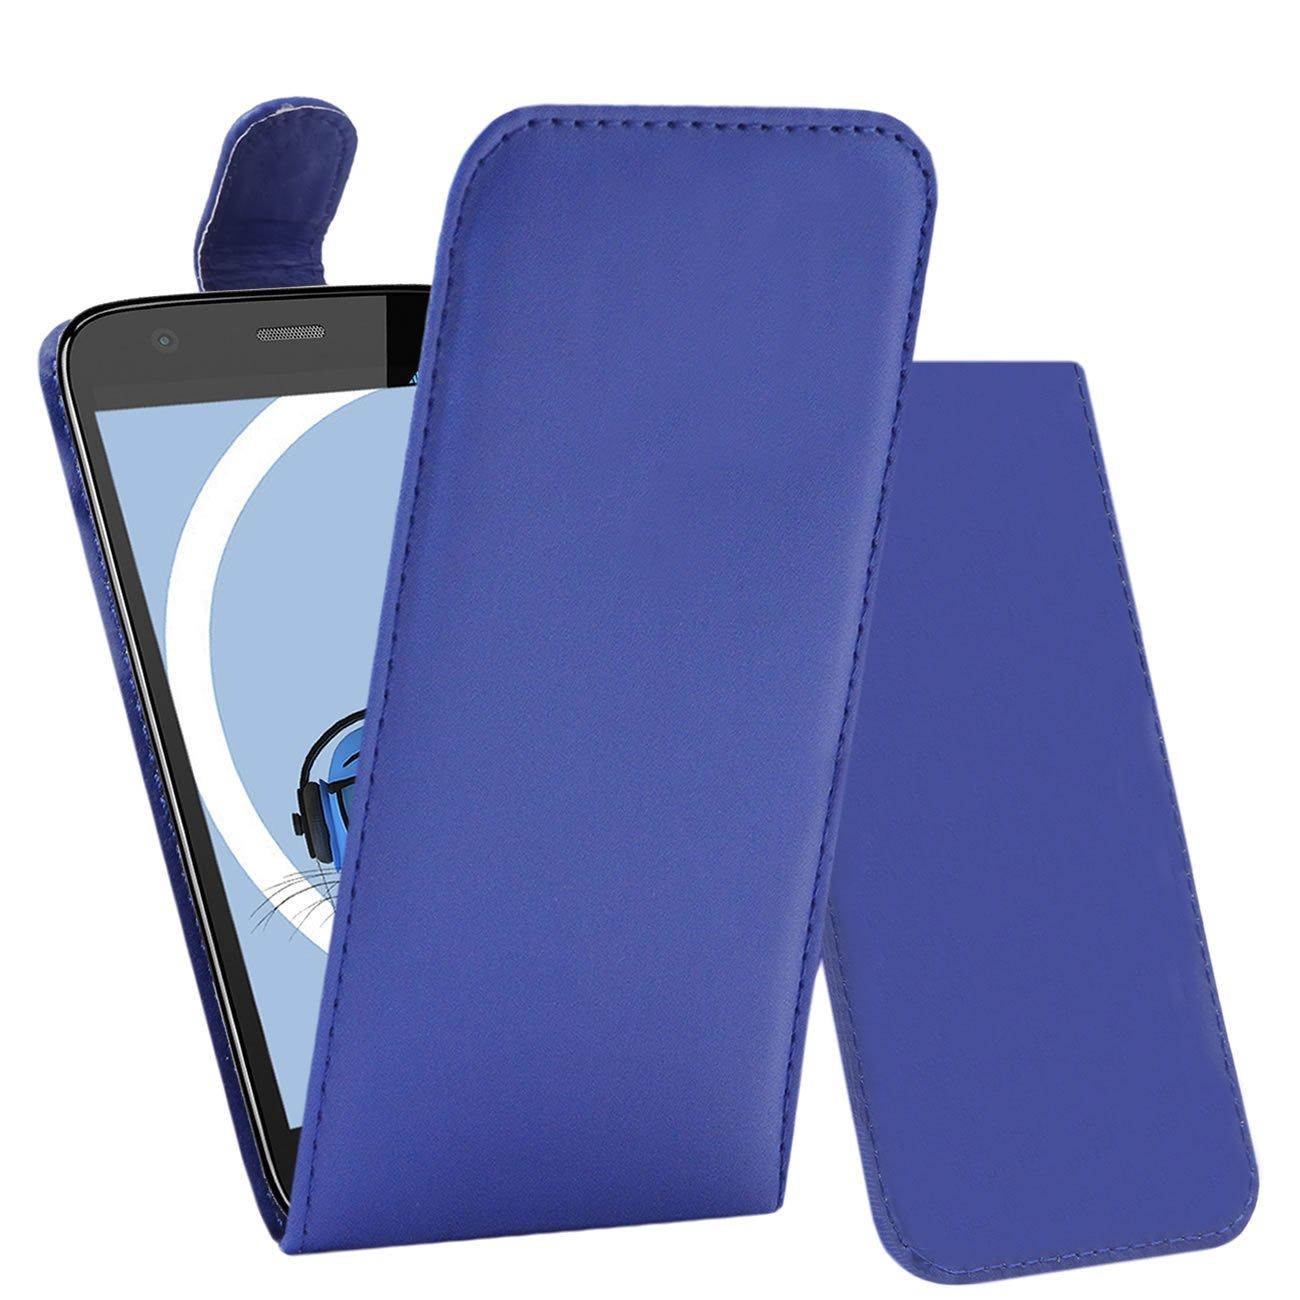 iTALKonline Motorola Moto G (2014) Moto G2 2nd Generation Blue PU Leather Executive Multi-Function Vertical Flip Wallet Case Cover Organiser